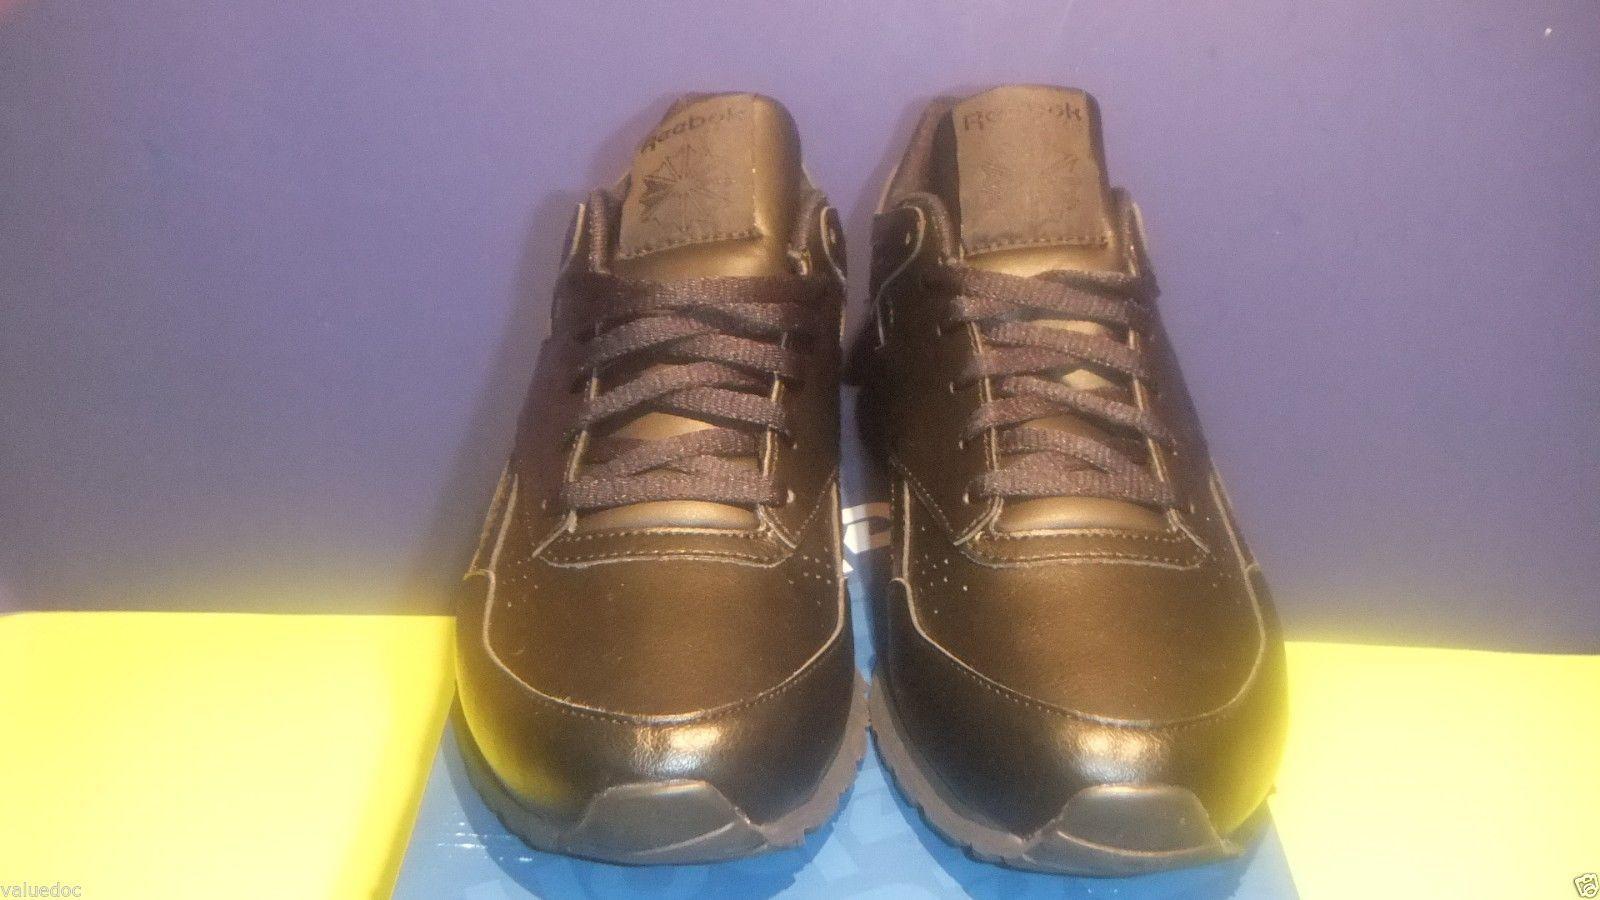 REEBOK RECORD MILE LEATHER MEN'S Size 5 EU 36.5 Black J88550